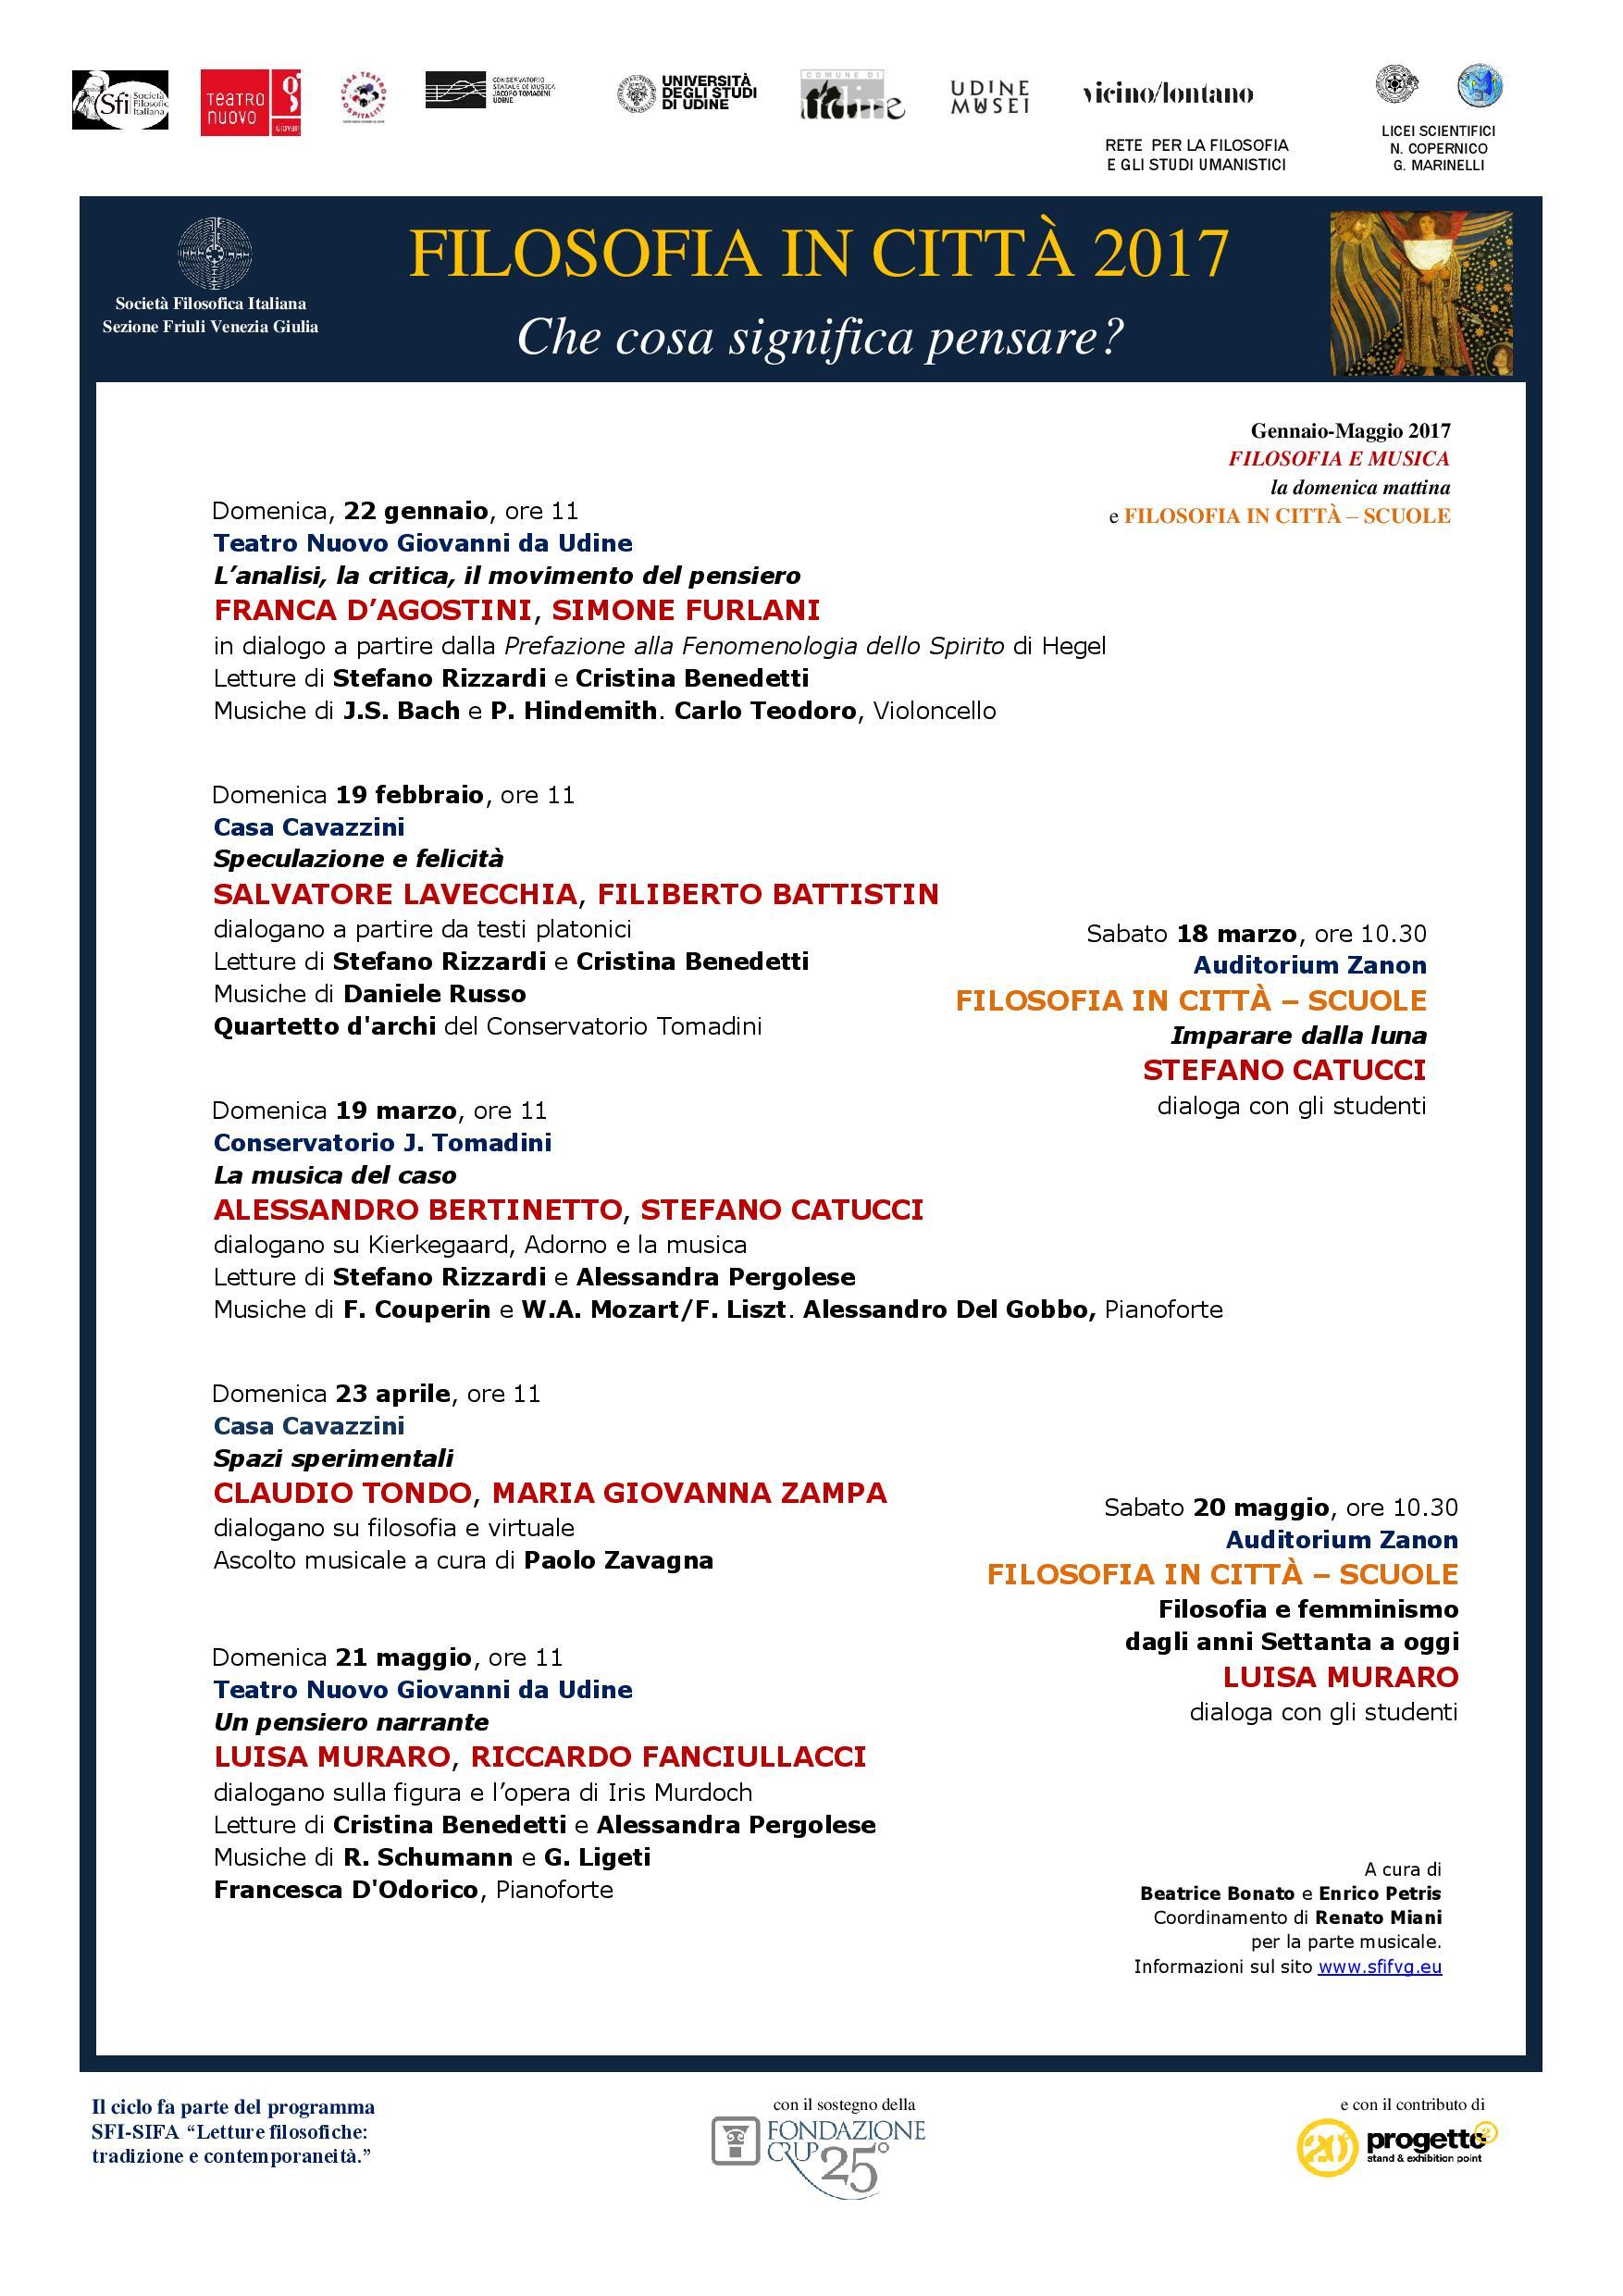 Locandina FILOSOFIA IN CITTA  2017